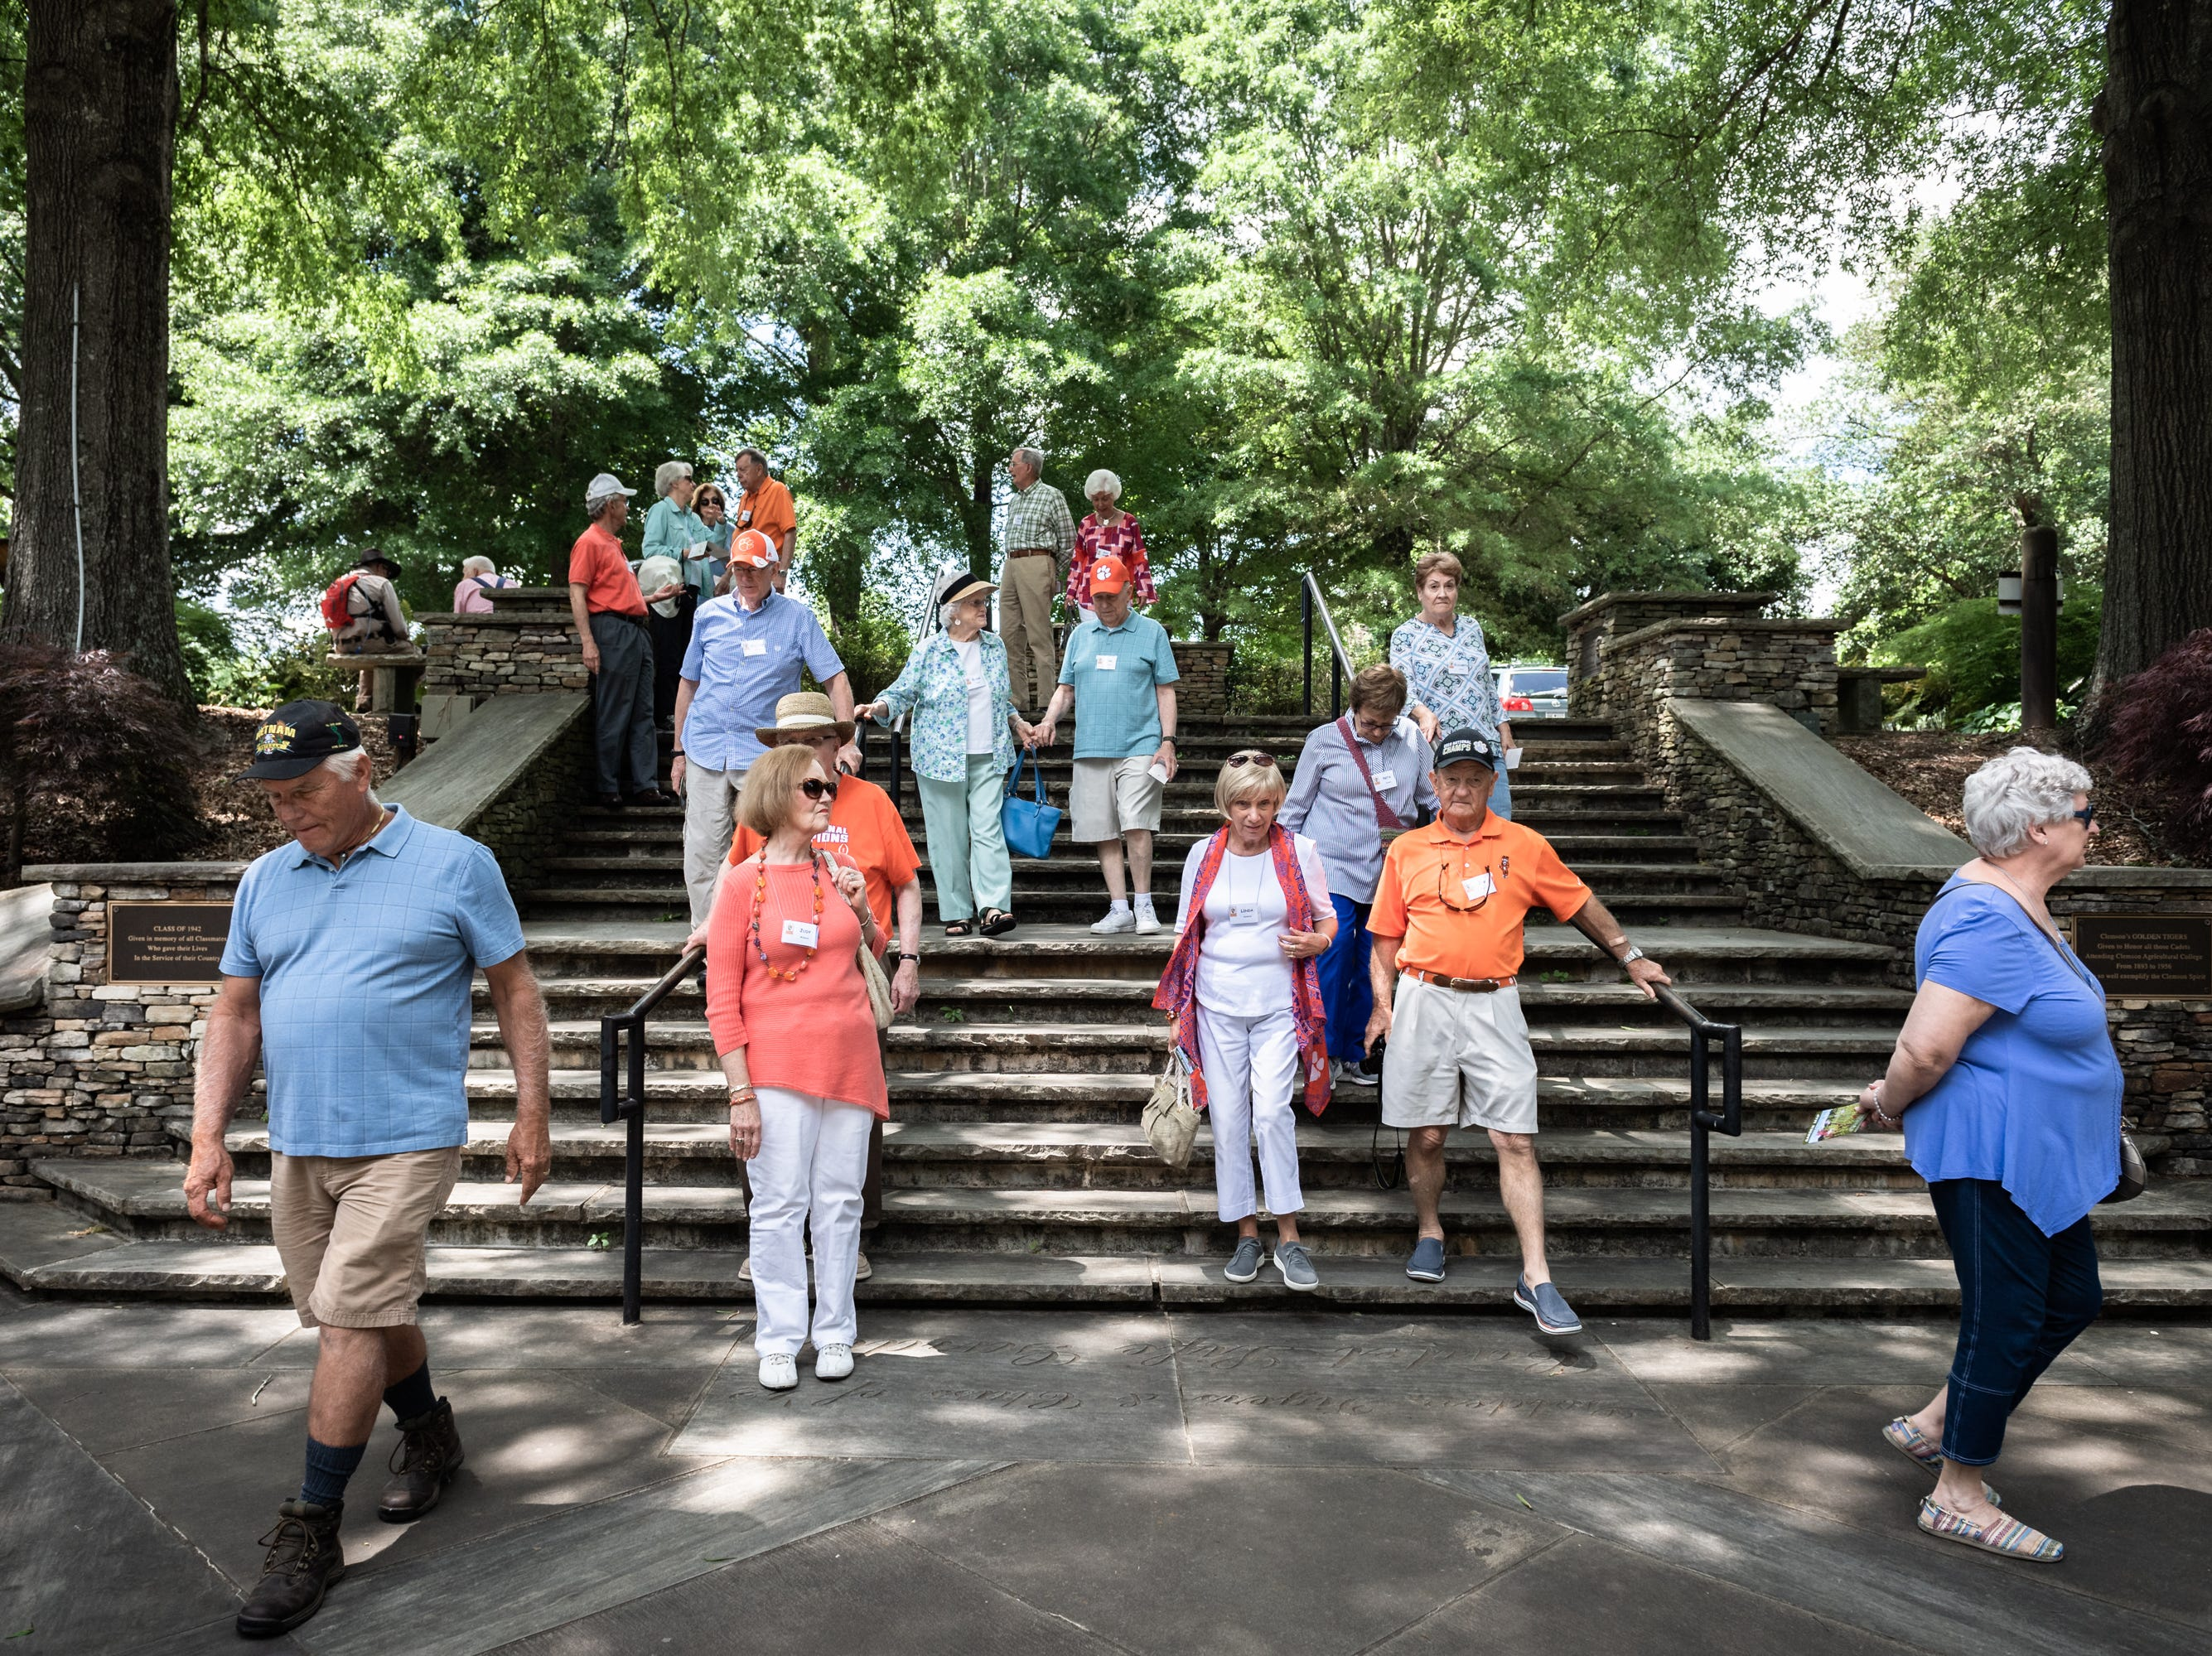 Members of the Clemson University fraternity Delta Kappa Chi, toured Clemson's South Carolina Botanical Garden Monday, May, 6, 2019, during their biennial reunion.